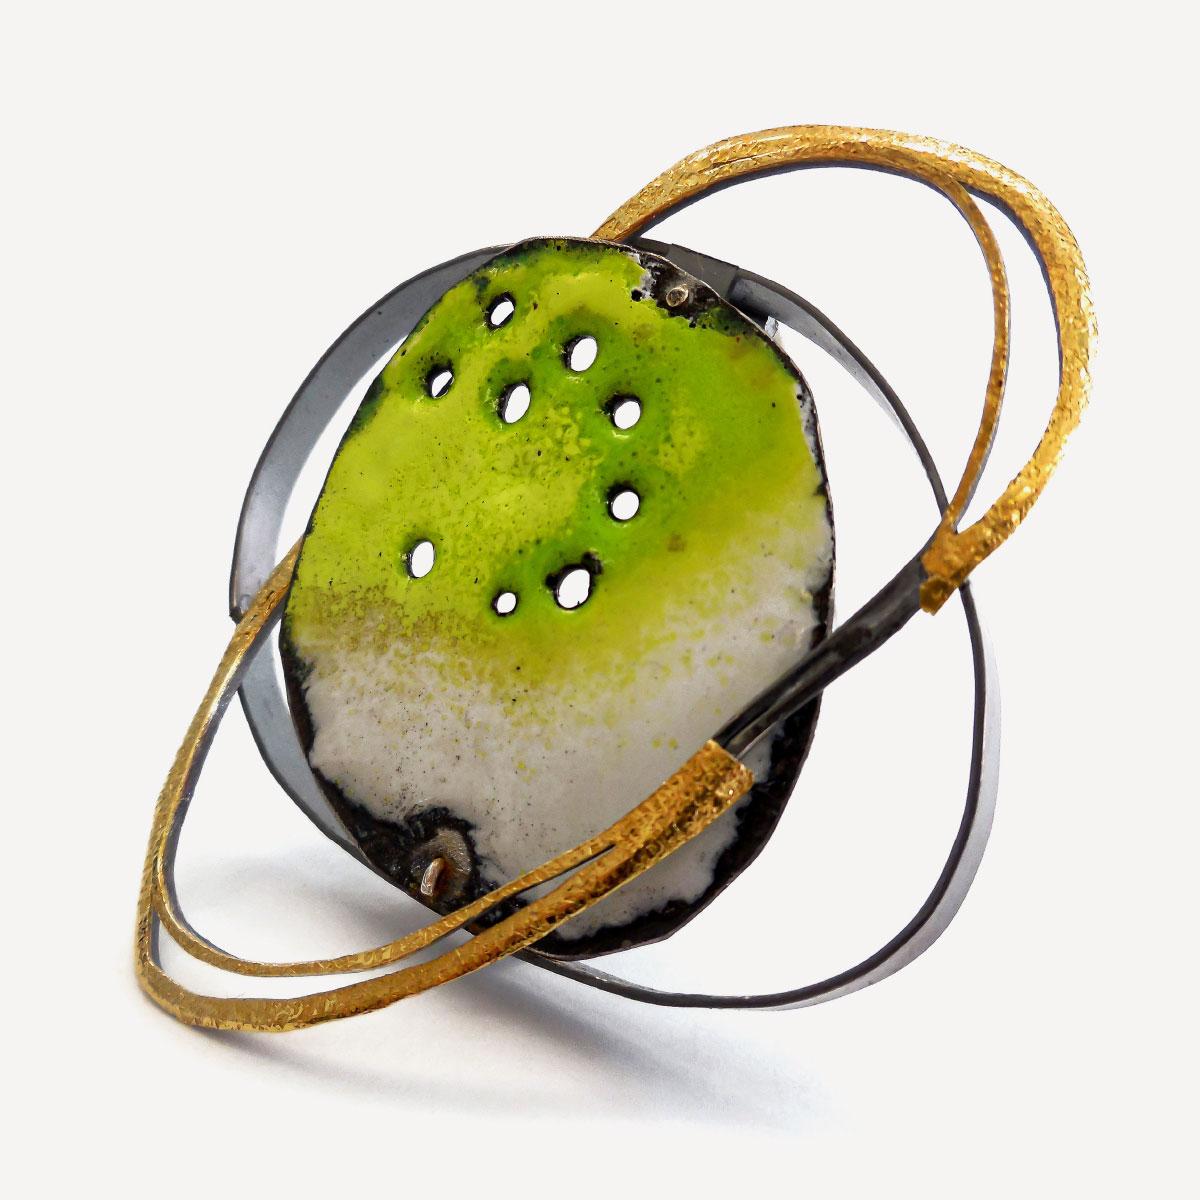 Brooch kosmos gold silver iron plate green enamel Giorgio Chiarcos Italiano Plurale artist